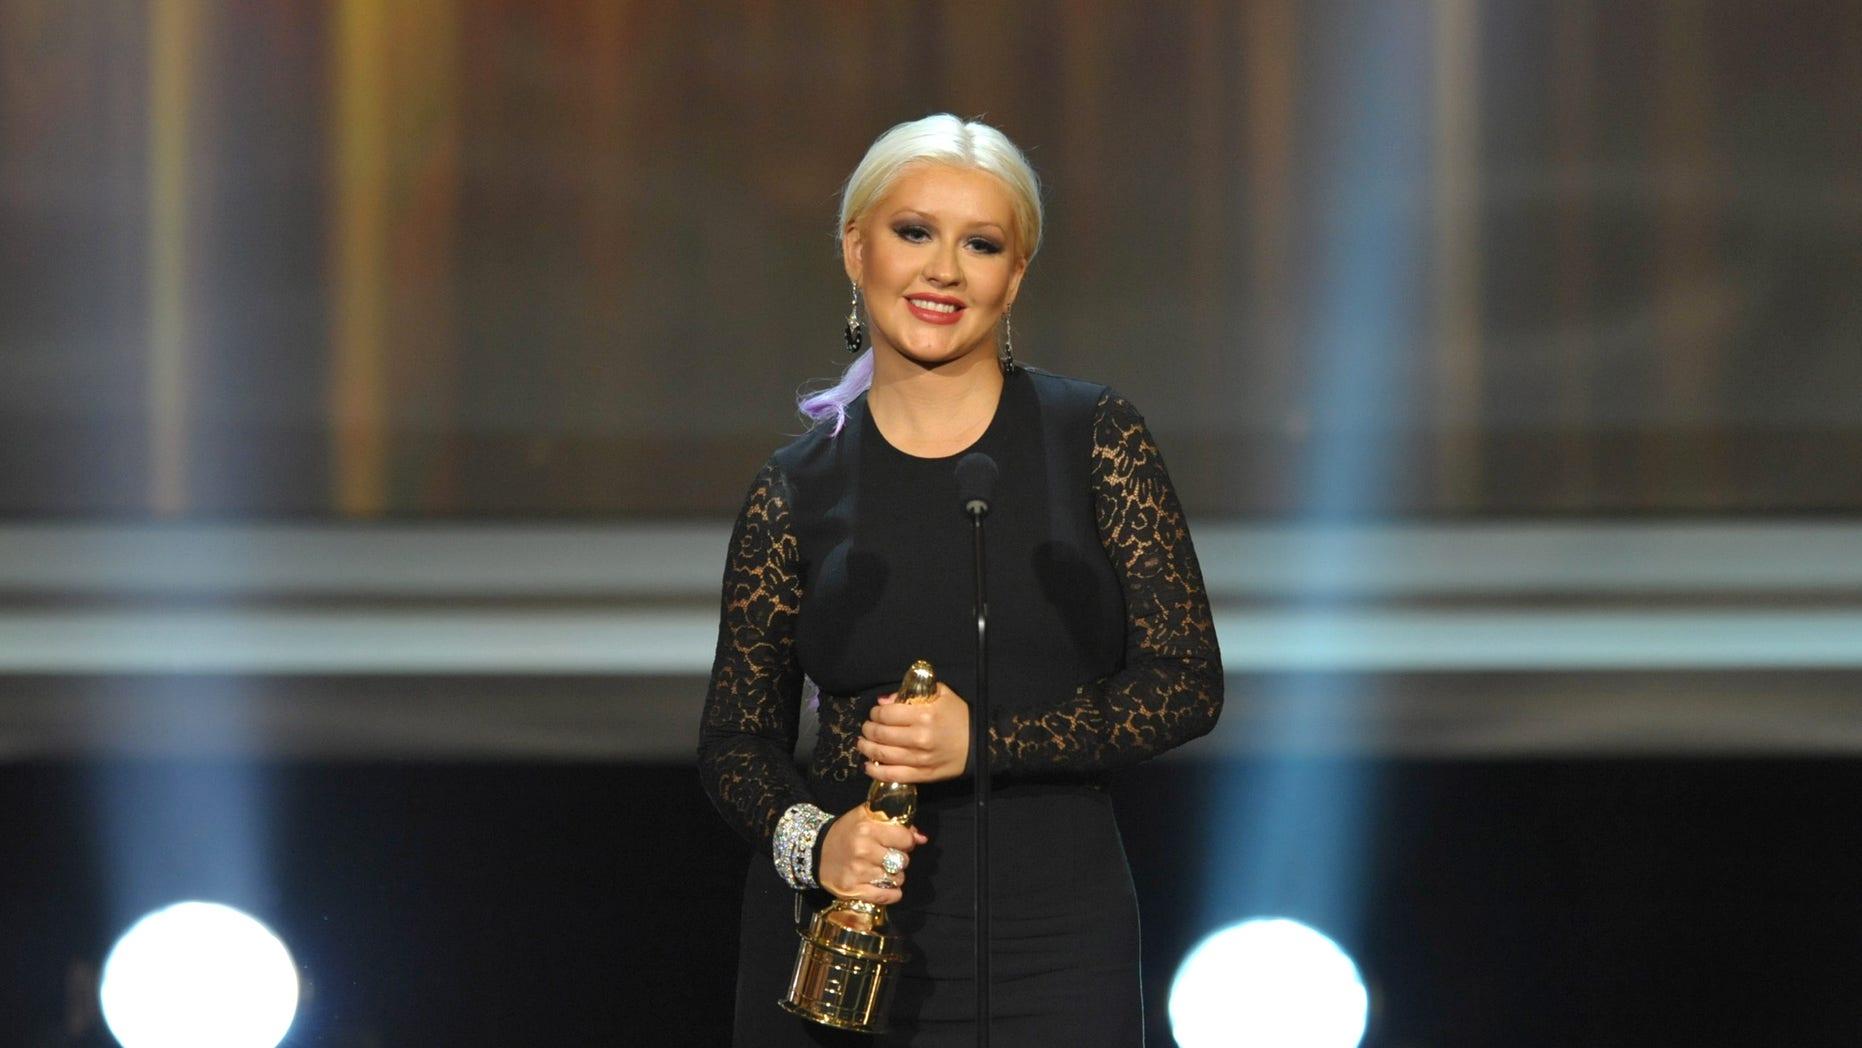 Christina Aguilera accepts the voice of a generation award at the ALMA Awards on Sunday, Sept. 16, 2012, in Pasadena, Calif. (Photo by John Shearer/Invision/AP)